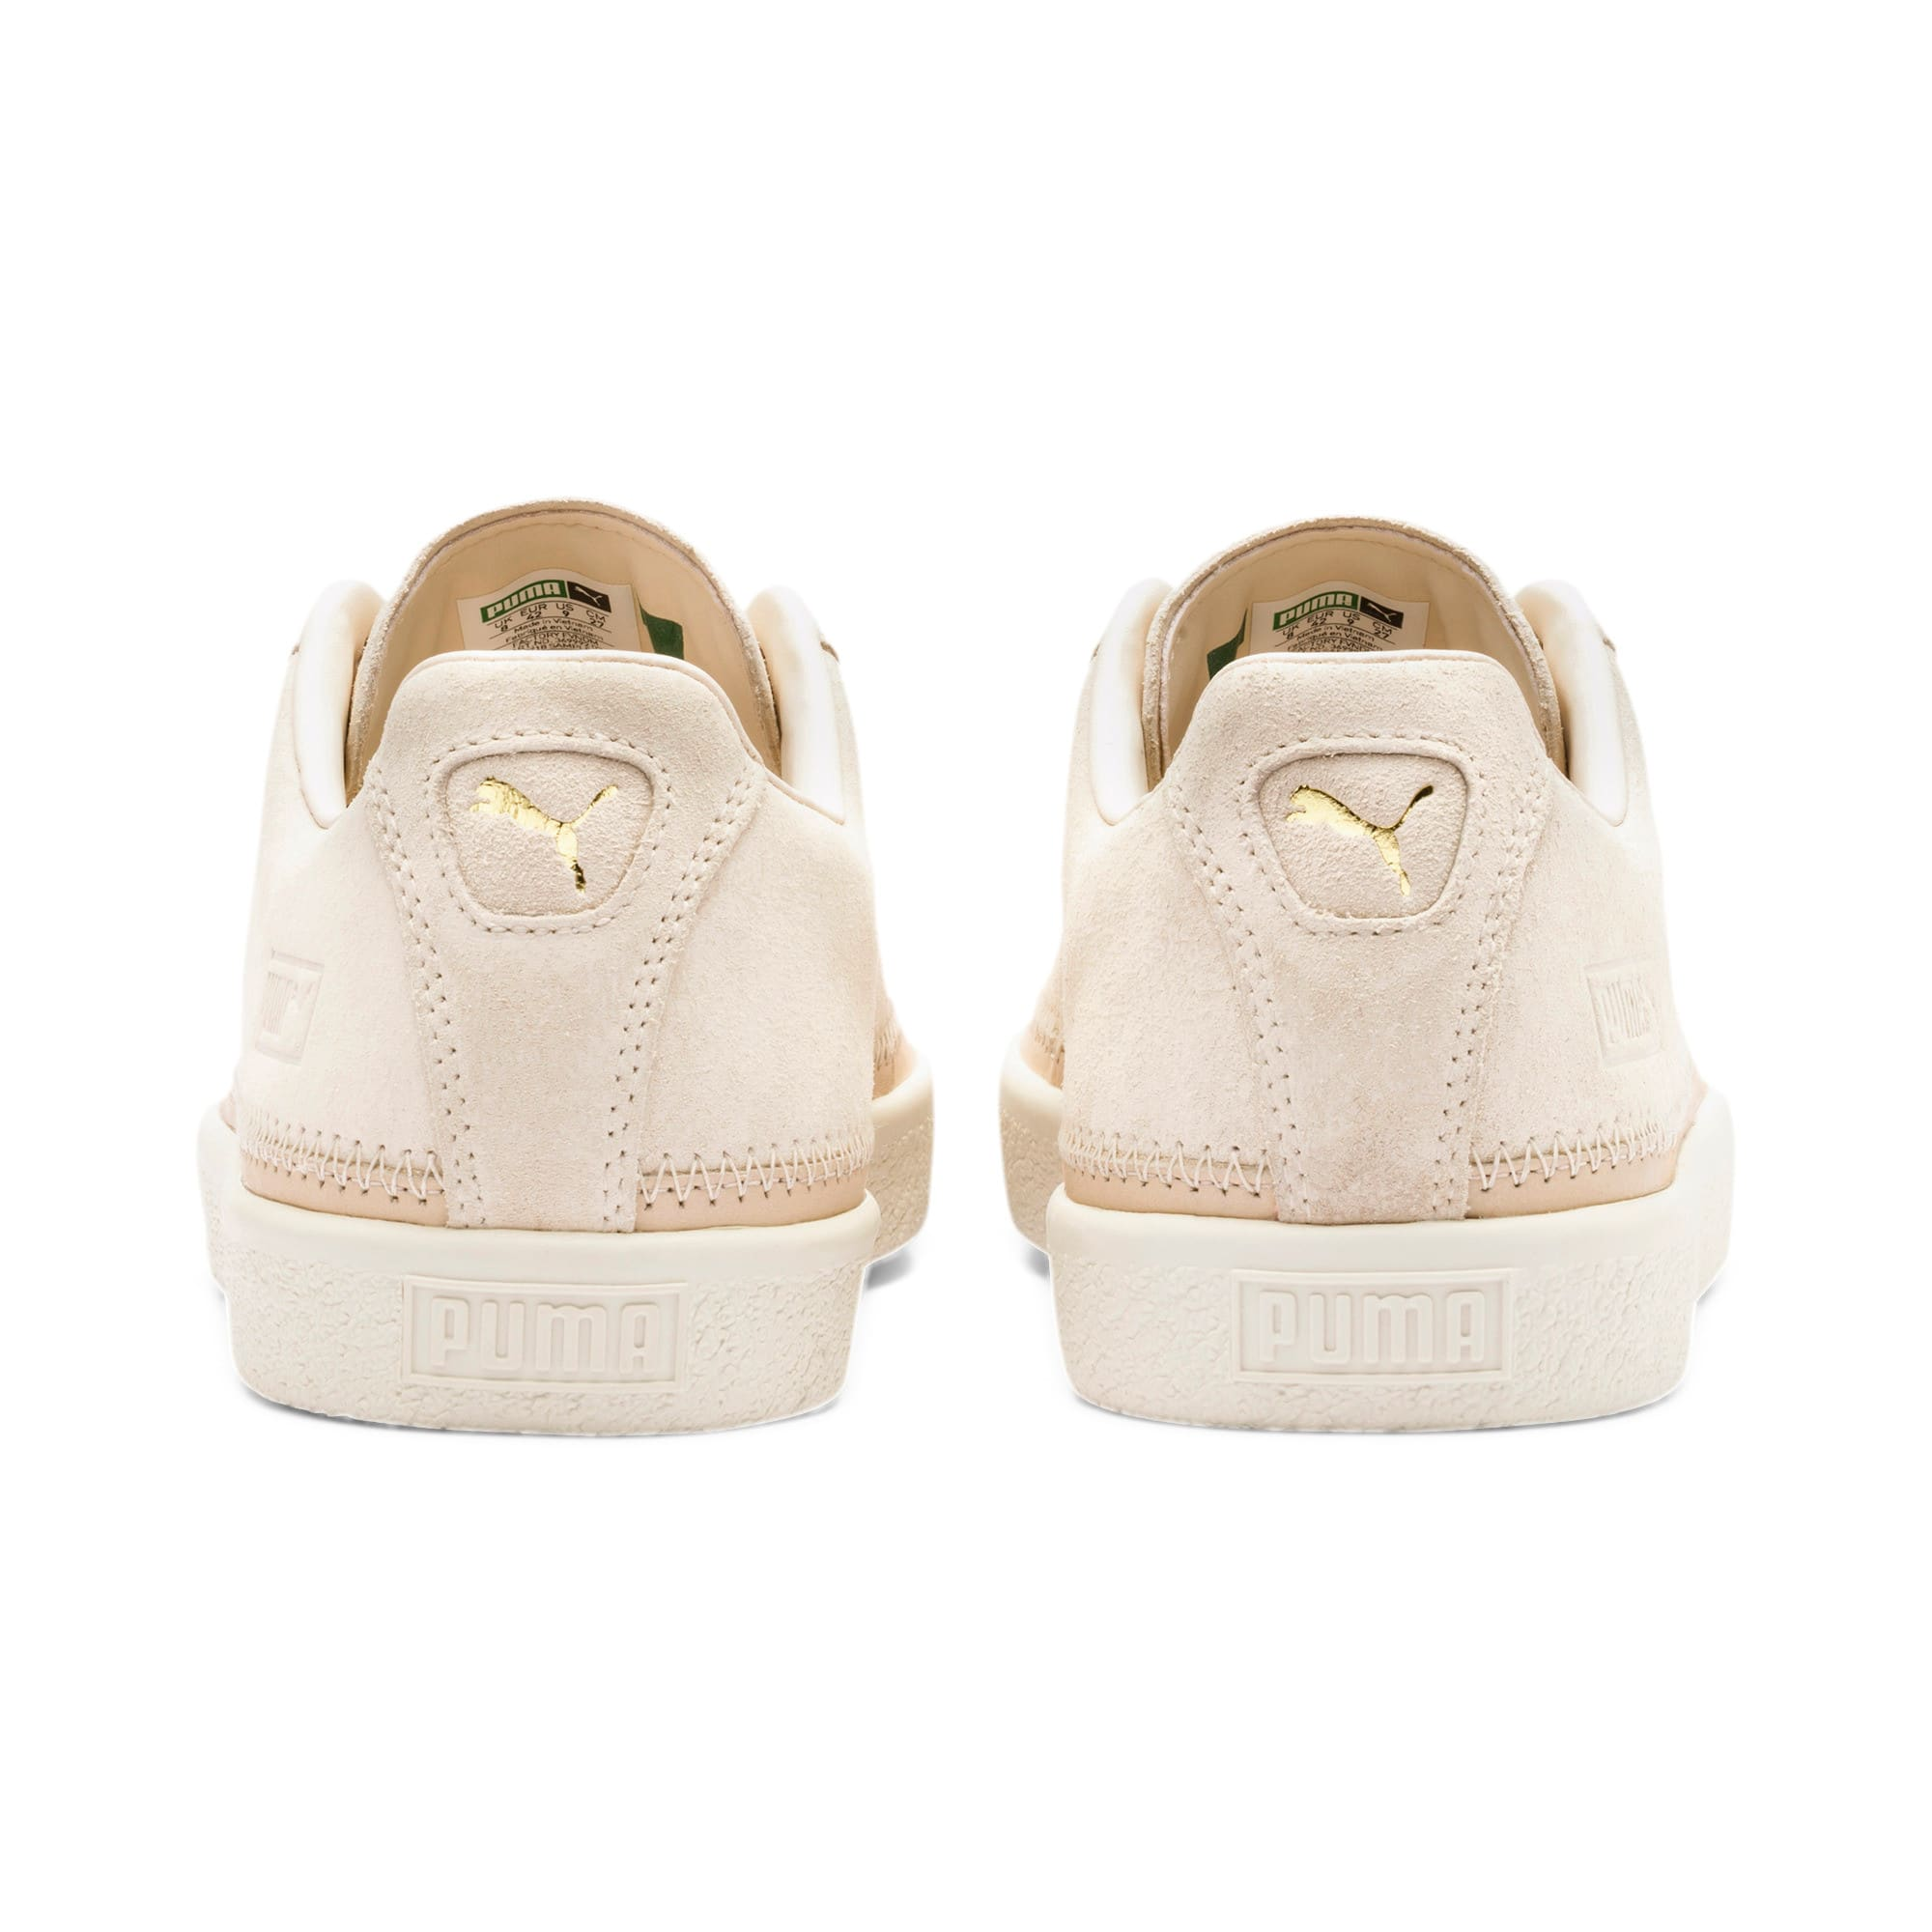 Miniatura 5 de Zapatos deportivos Suede Trim PRM, White Smoke-Whisper White, mediano